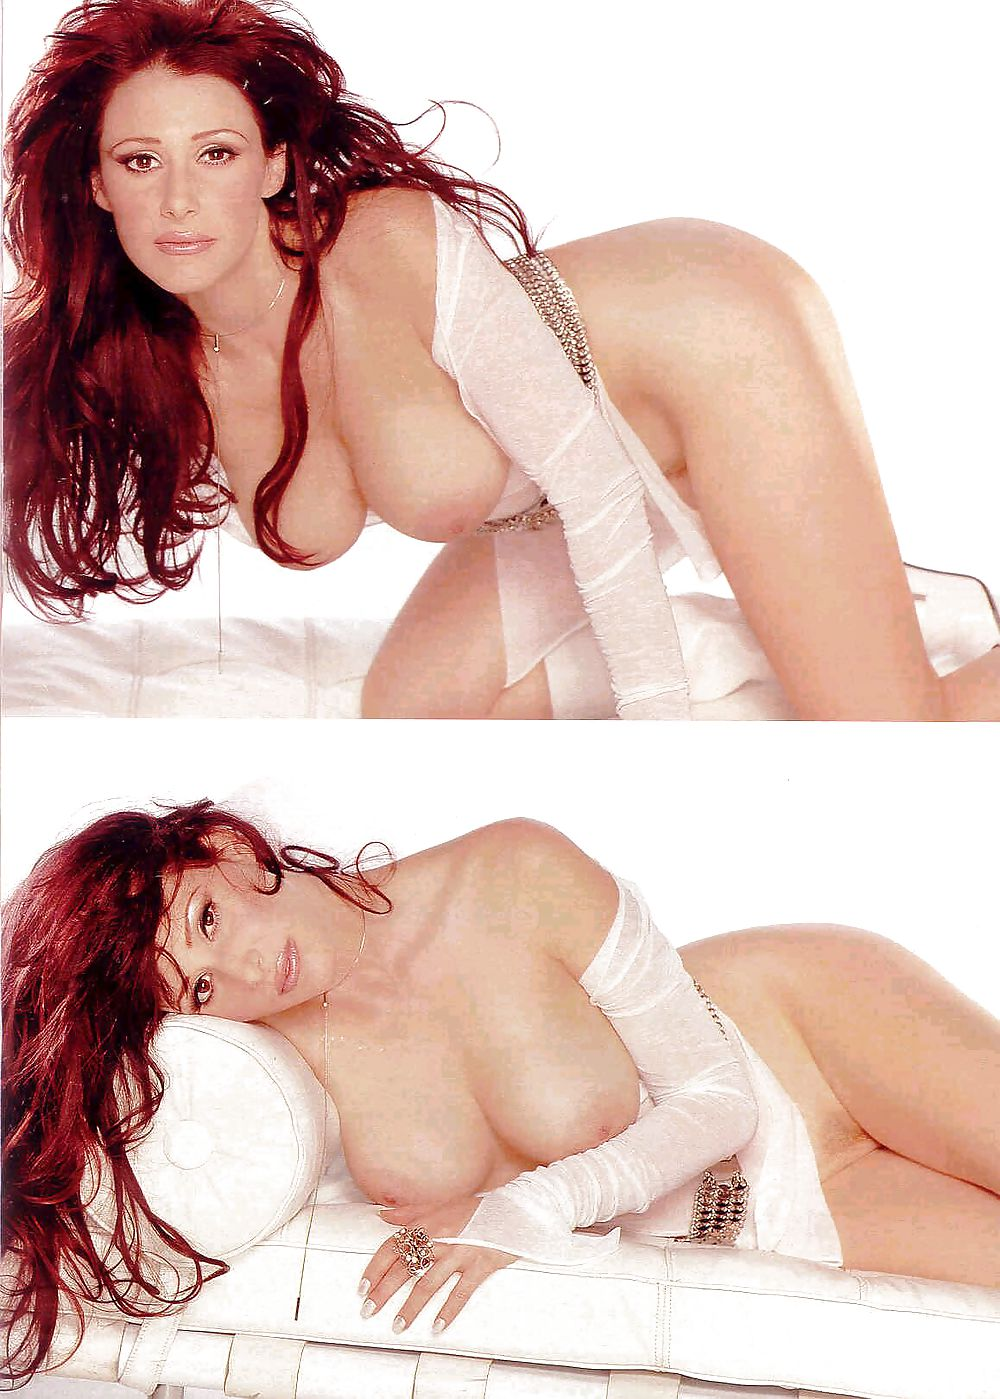 Sloppy Blowjob Nude pics